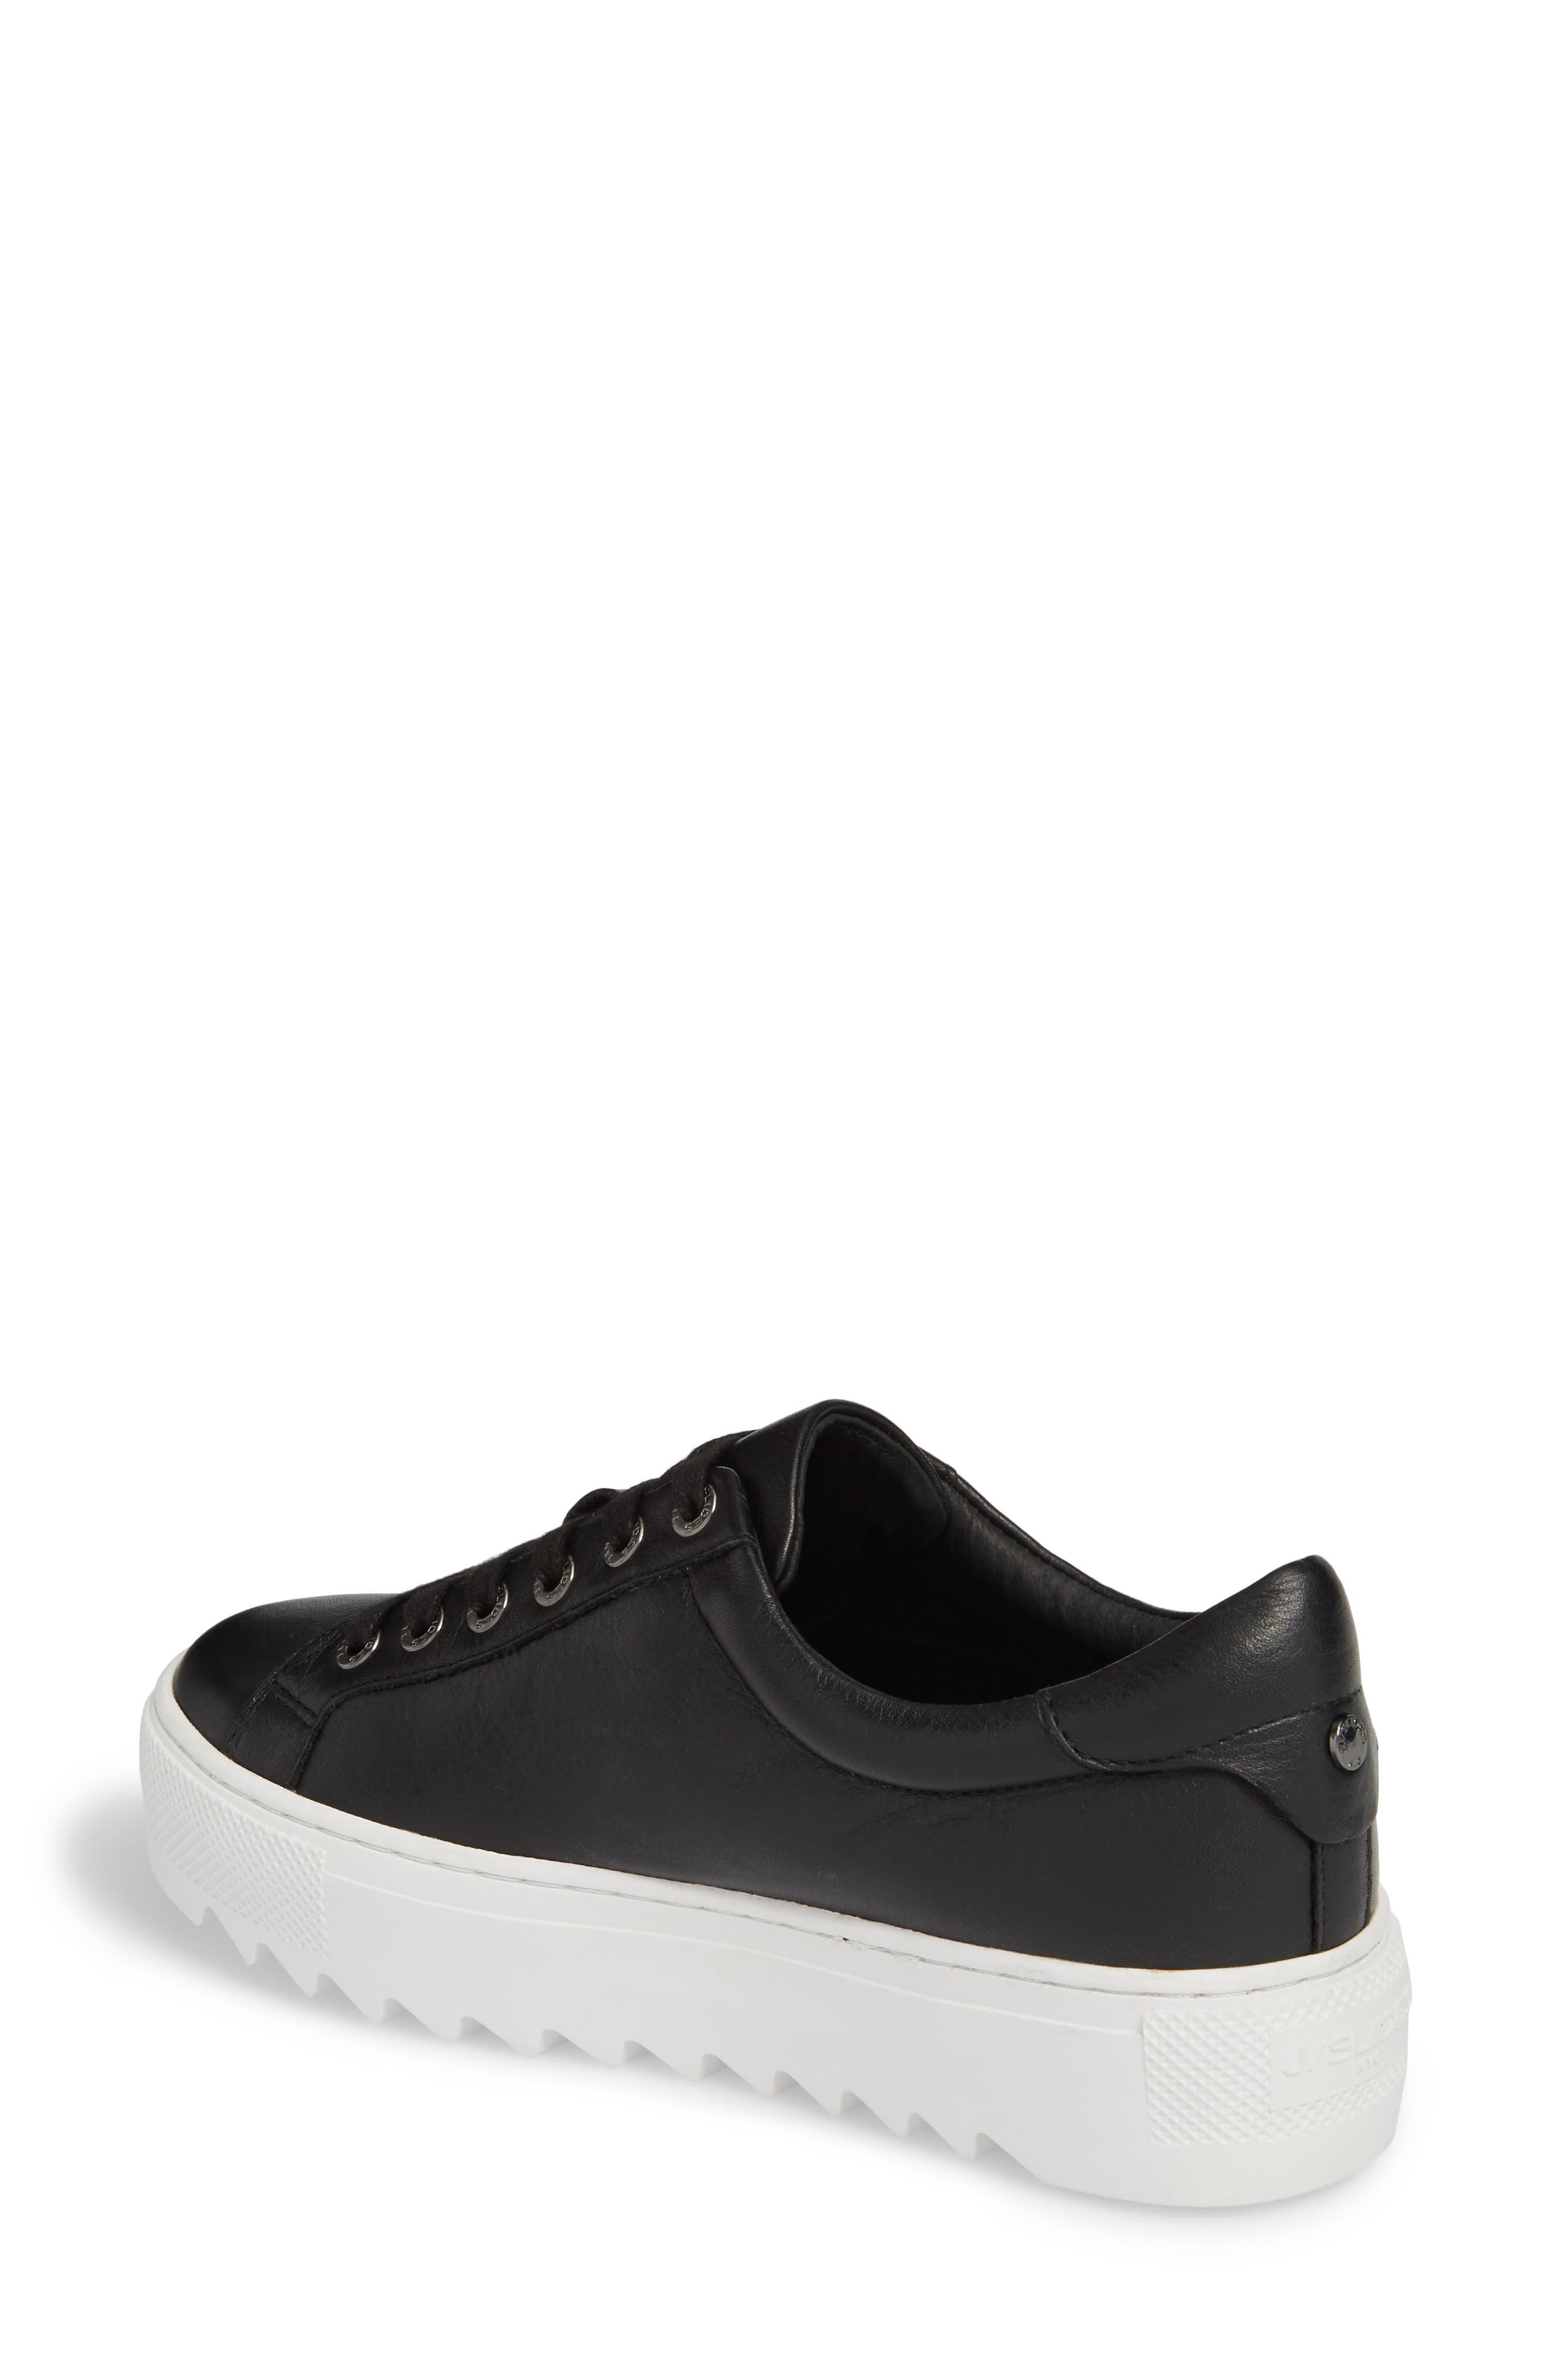 Sapphire Platform Sneaker,                             Alternate thumbnail 2, color,                             015